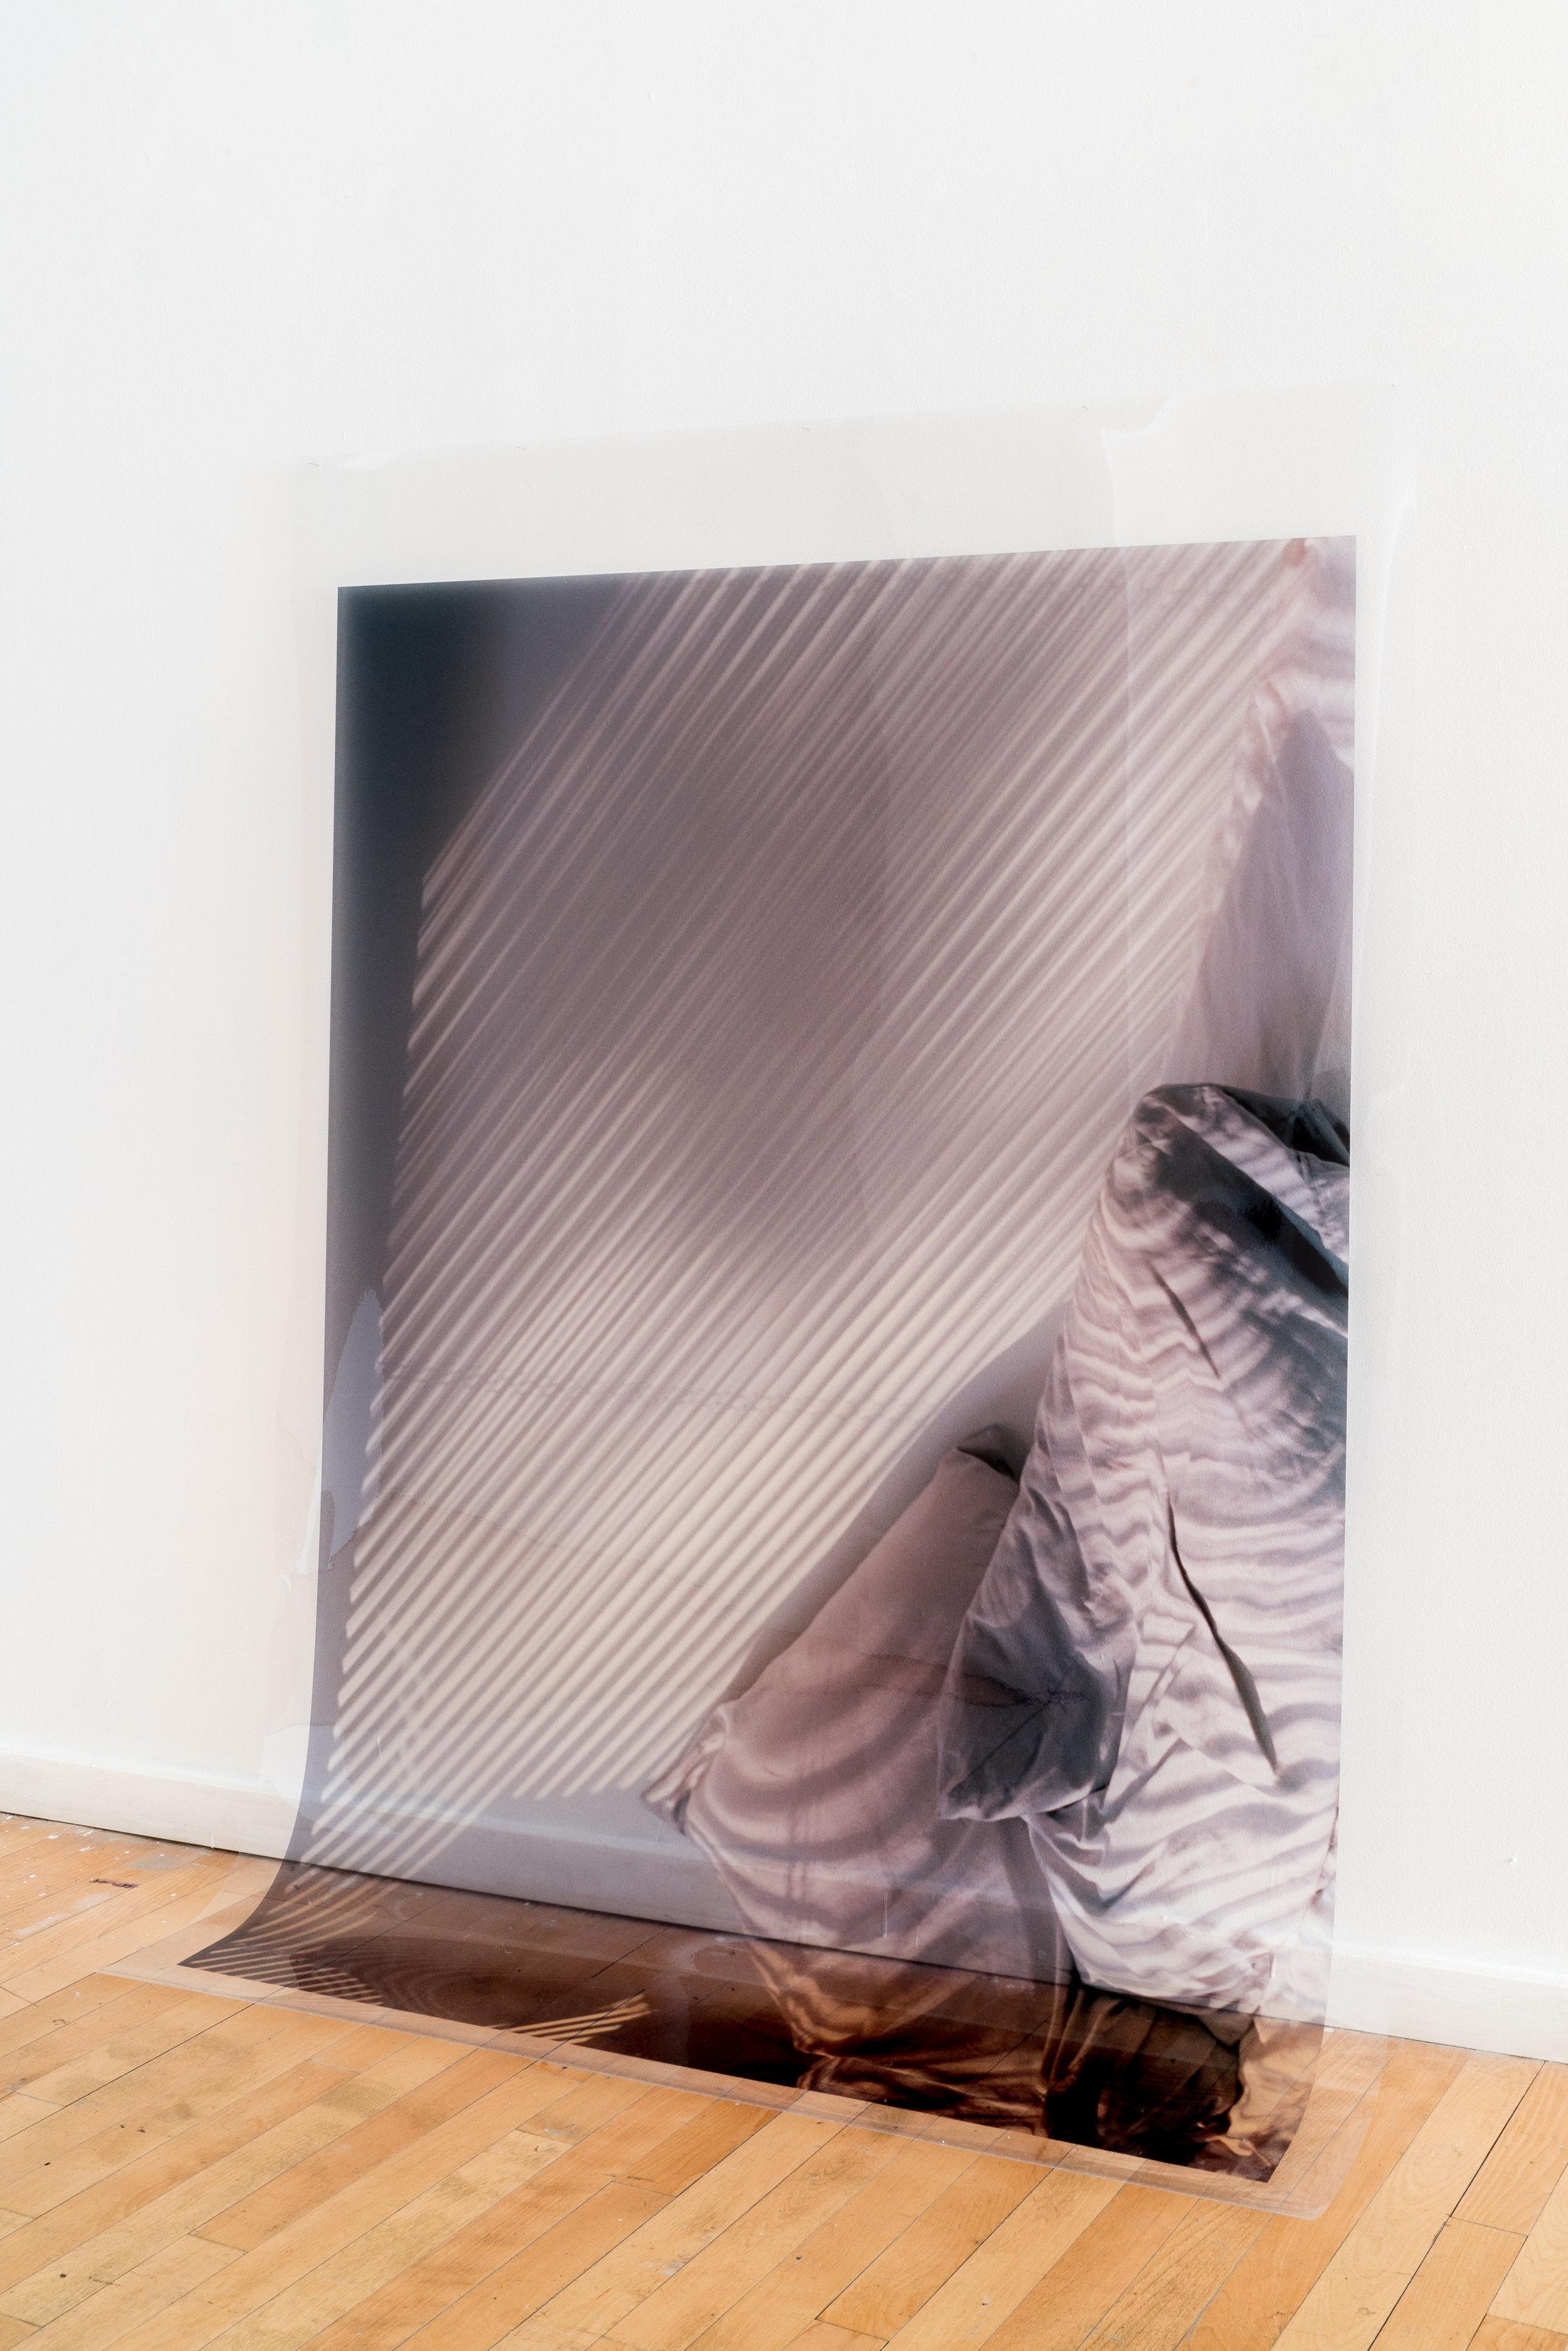 A Bedroom Full of Light . Xan Shian. 44 x 60 in. Colour Inkjet print on transparency. 2017.